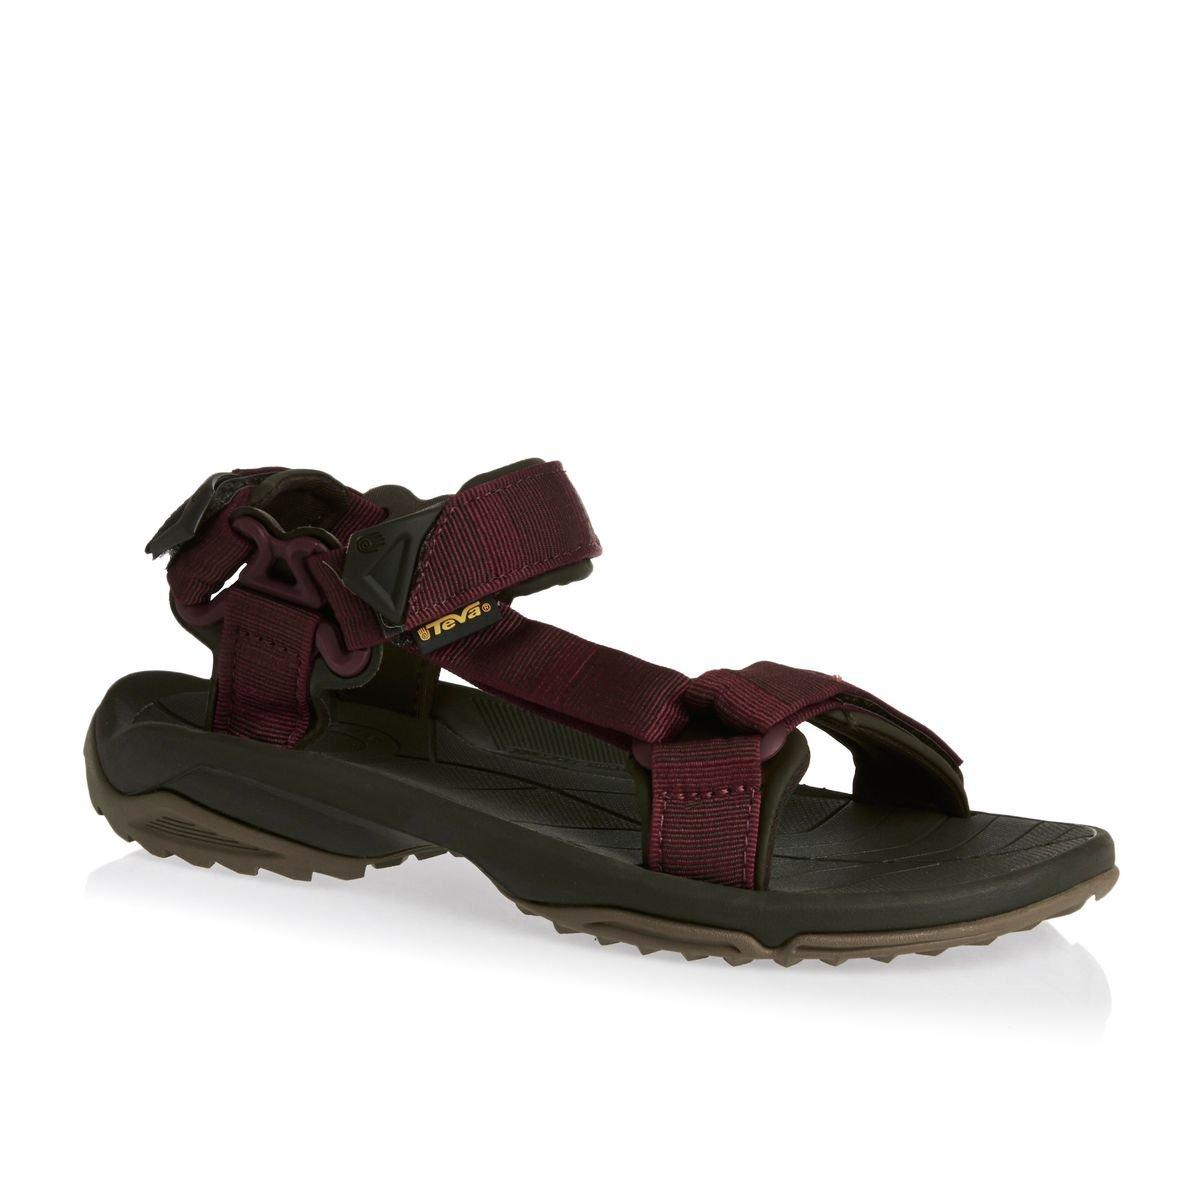 8815458d20327 Teva Terra FI Lite Walking Sandals - 13  Amazon.co.uk  Shoes   Bags